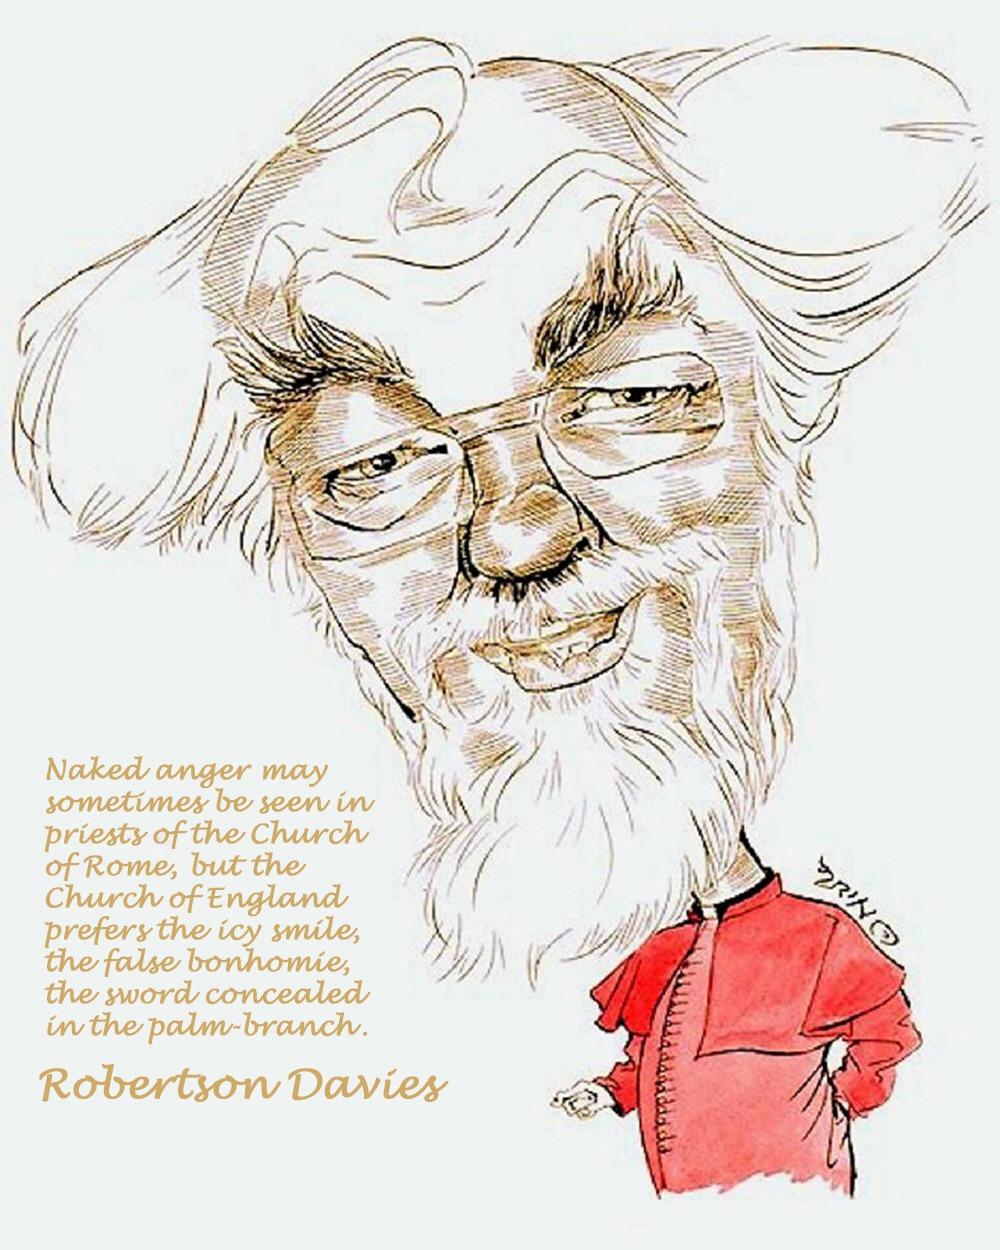 00 Robert Davies on Anglicans. 04.12